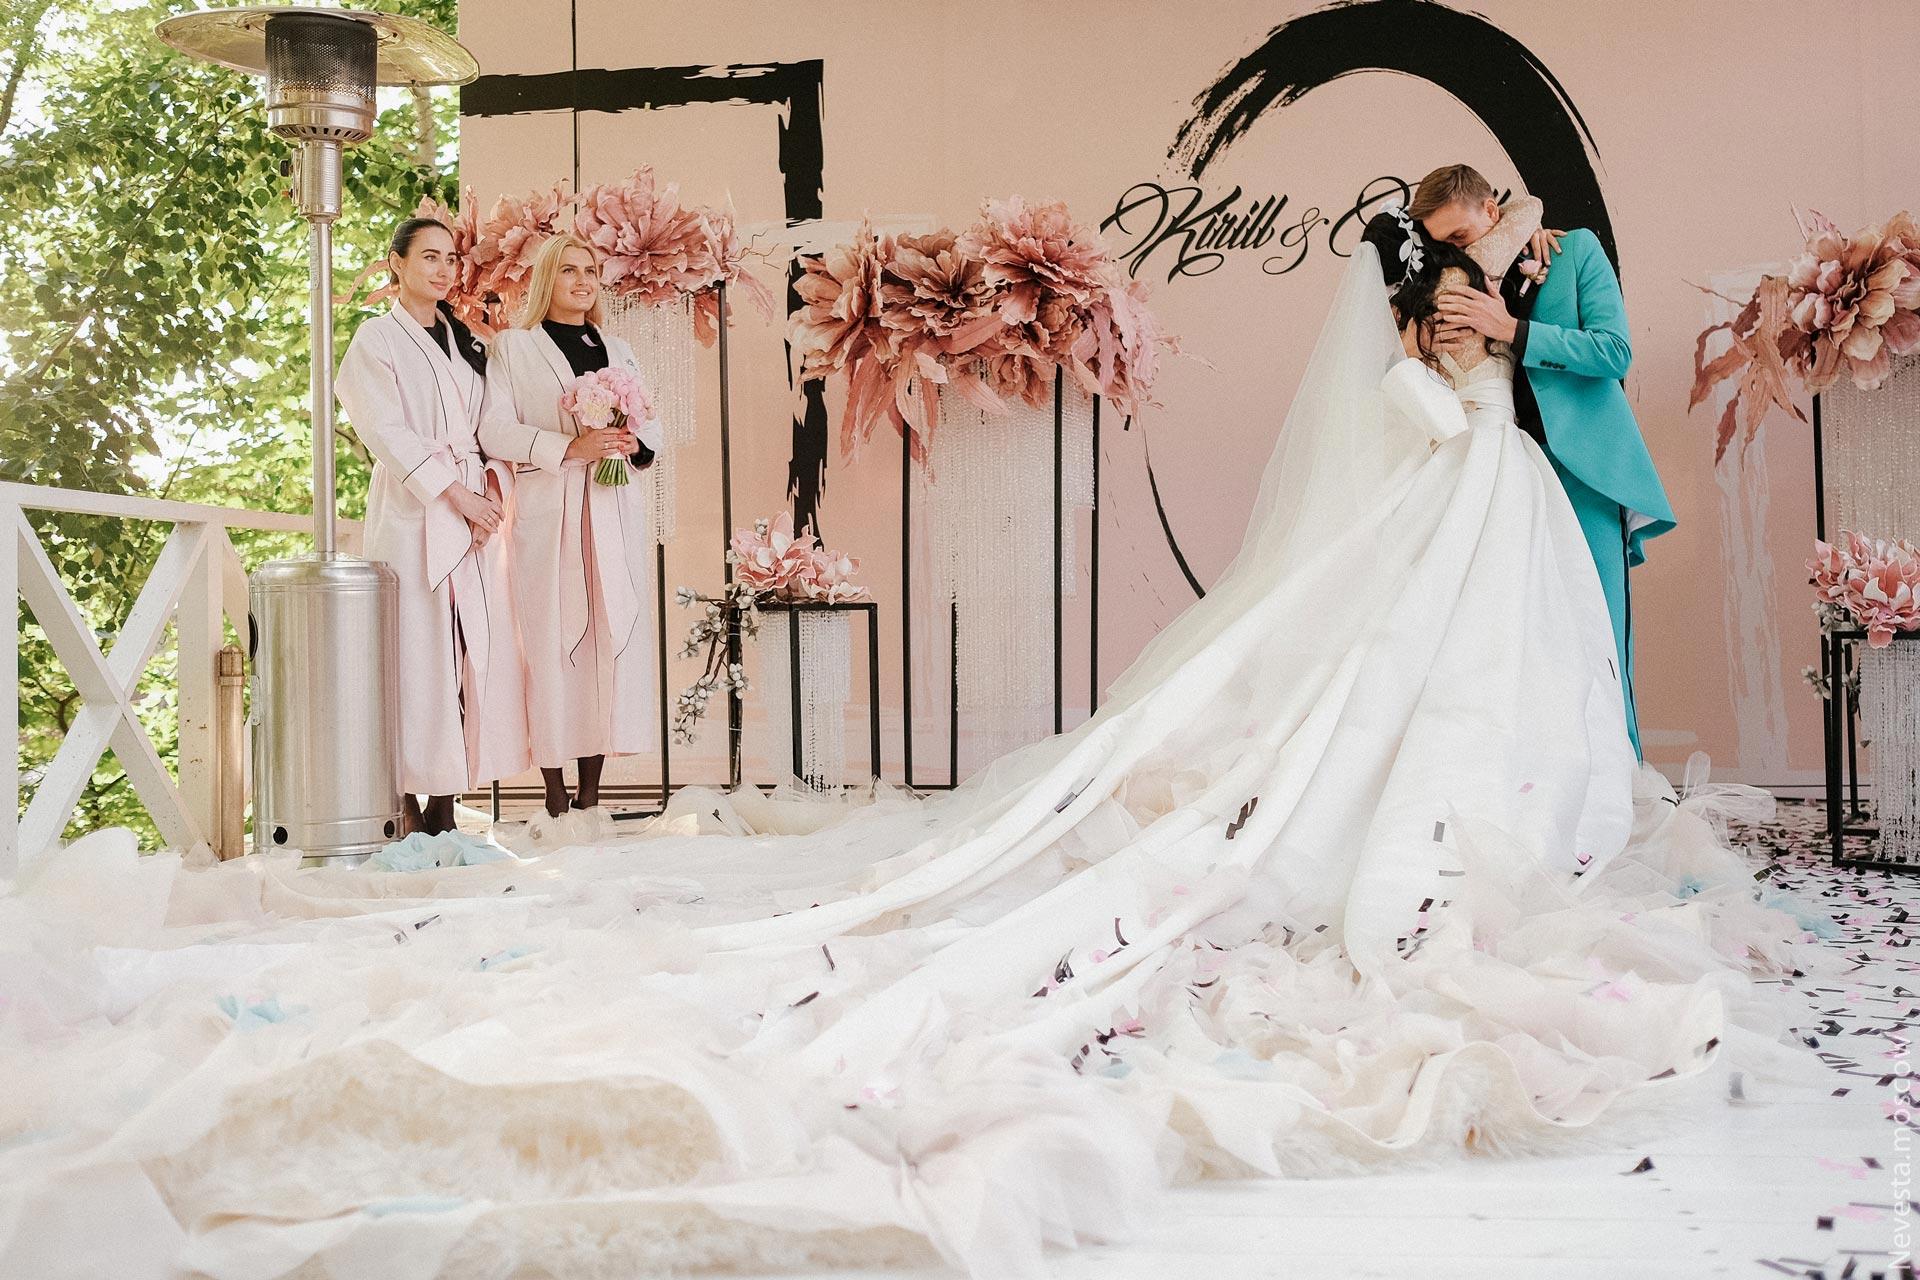 Свадьба Нелли Ермолаевой и Кирилла Андреева фото 29